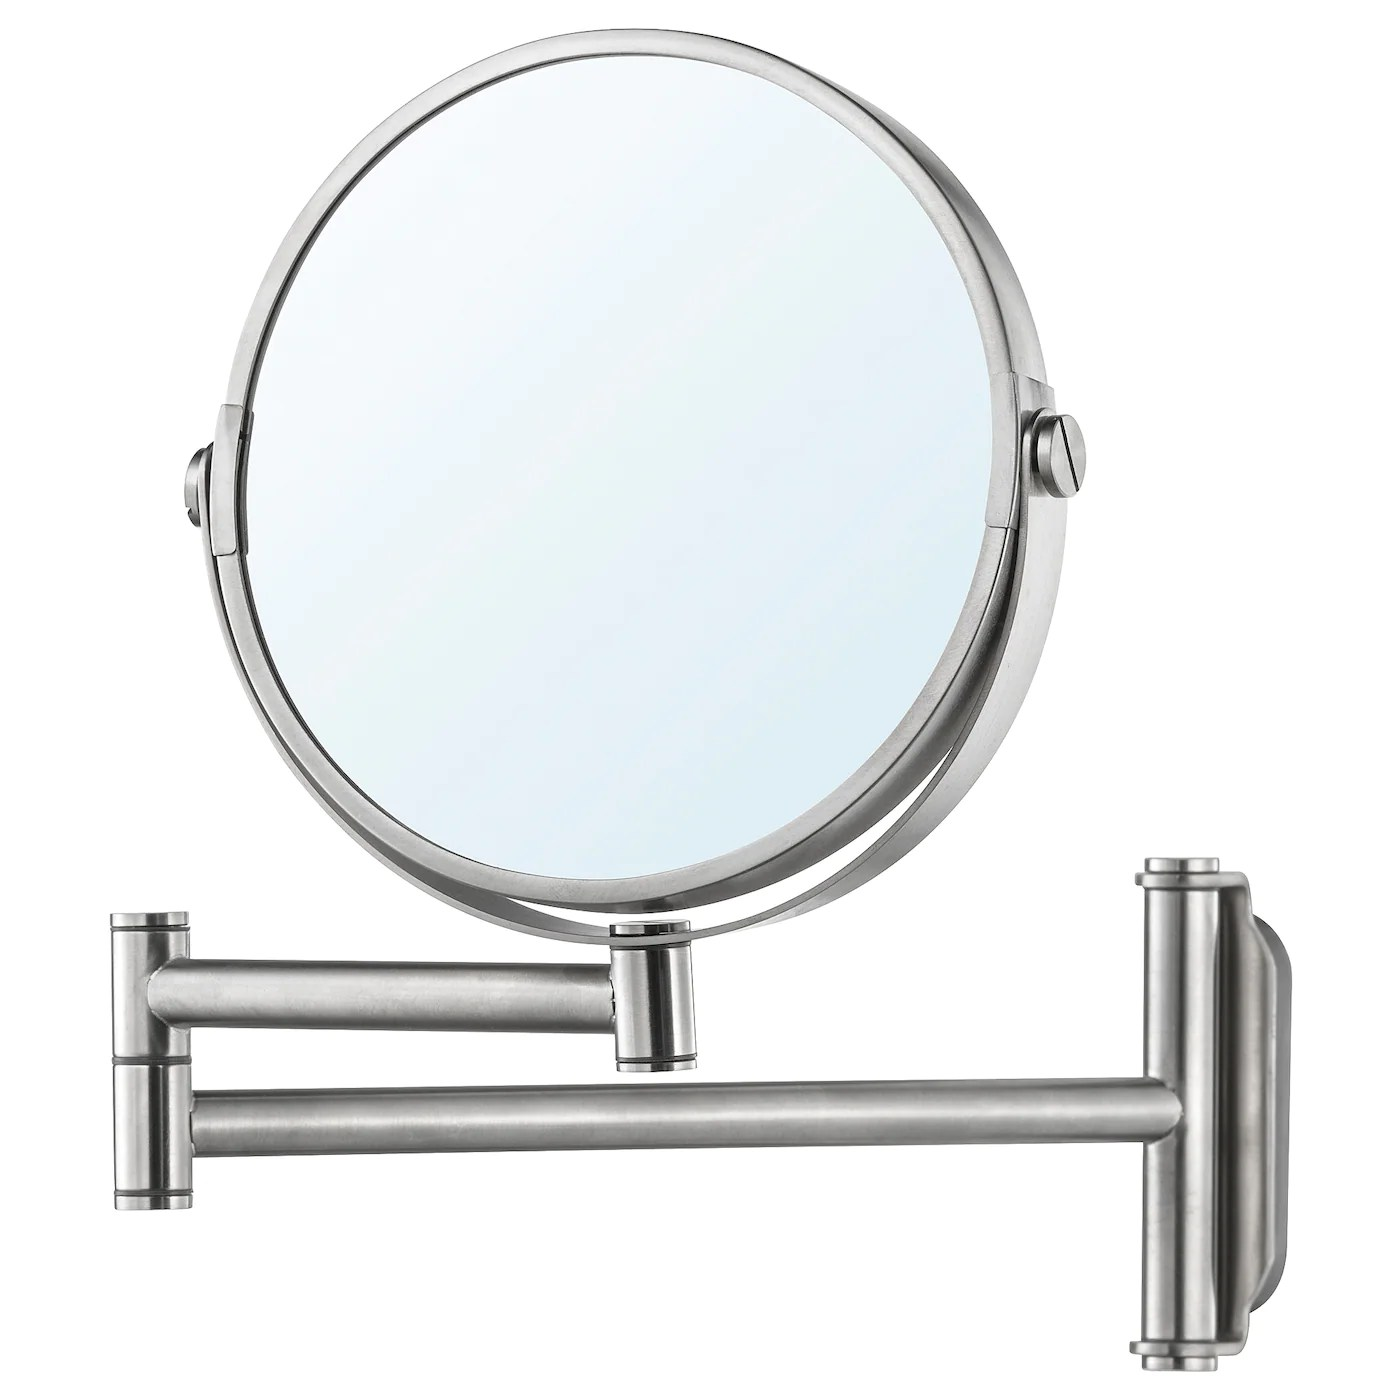 Brogrund Miroir Acier Inox 3x27cm Trouvez Le Ici Ikea